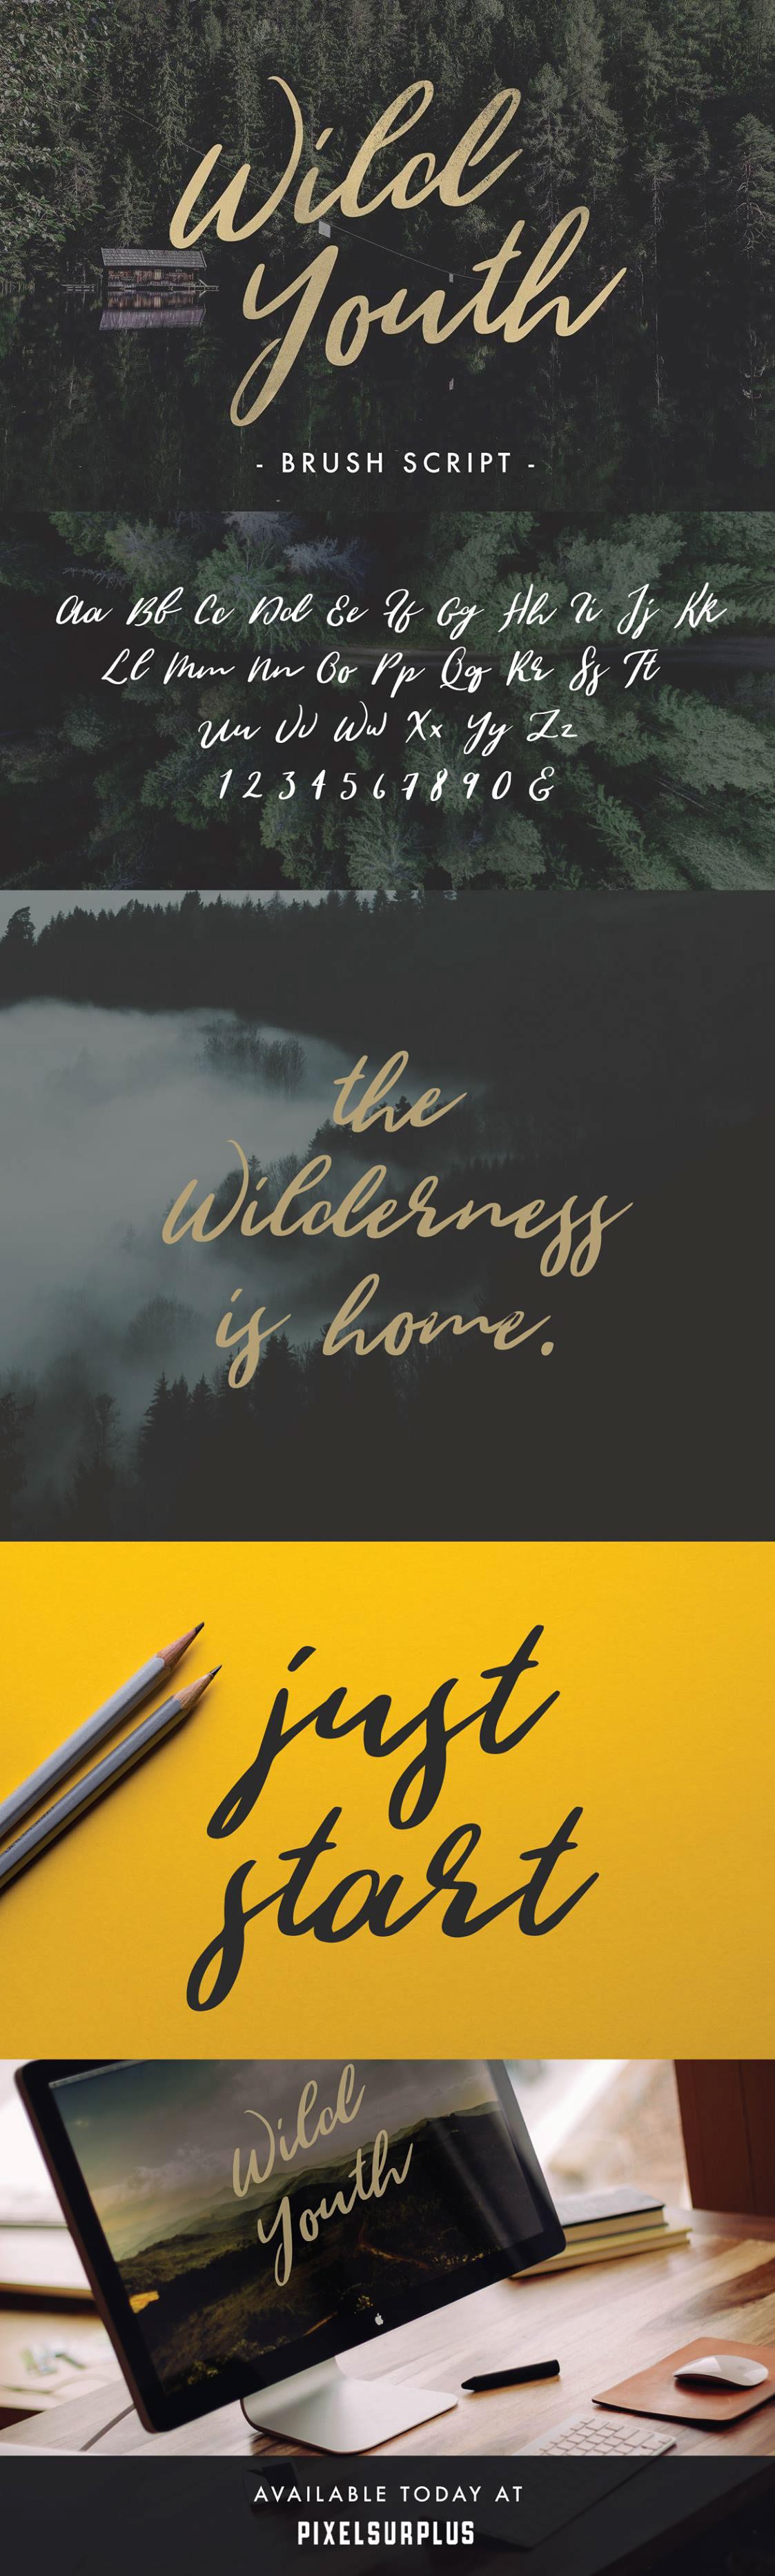 Wild Youth - Free Brush Script